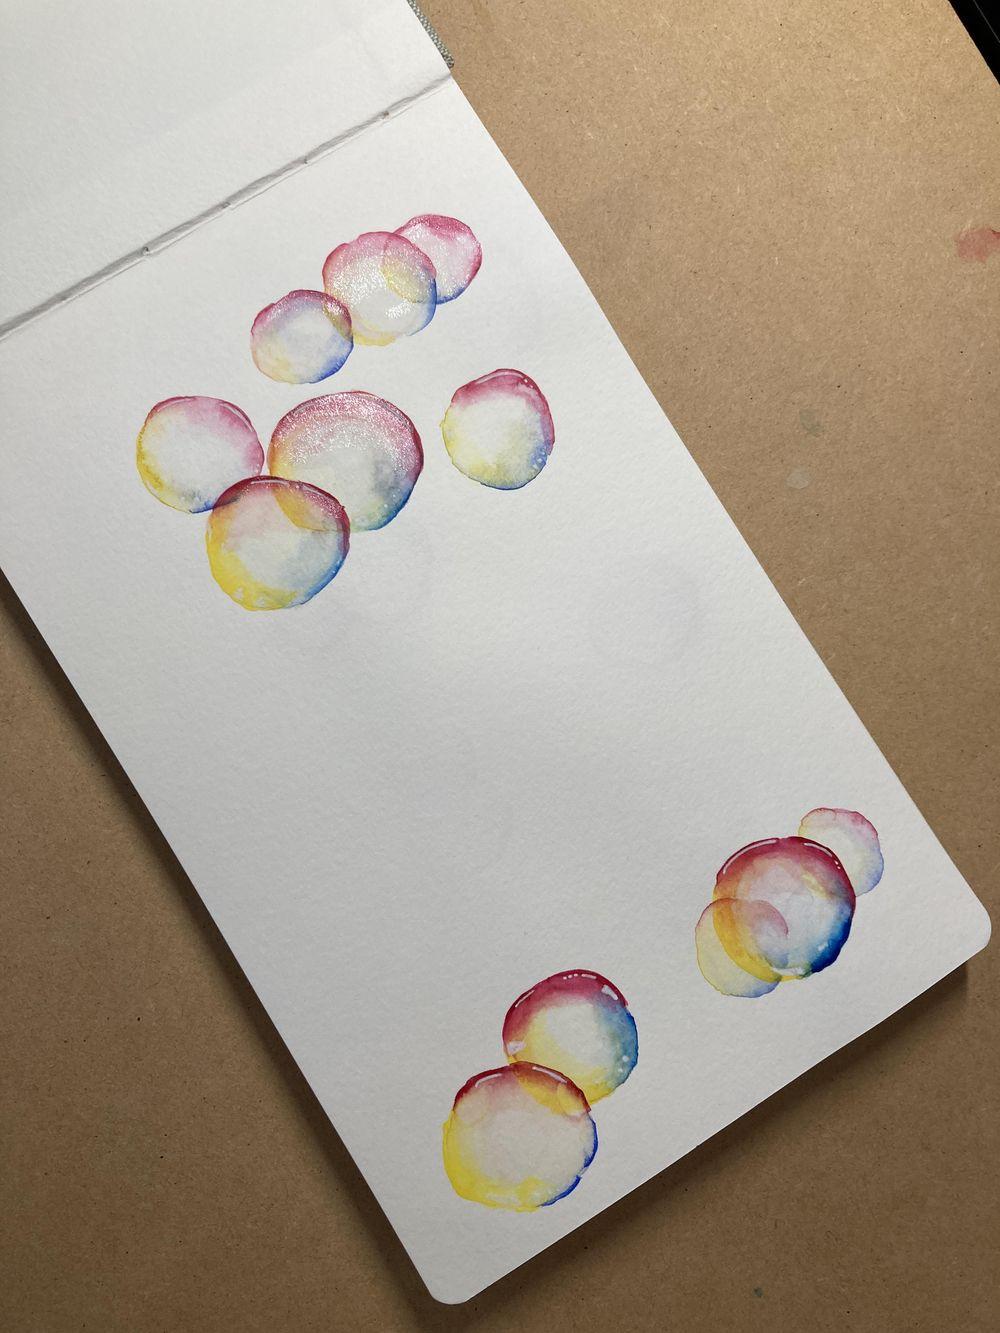 Bubbles! - image 1 - student project